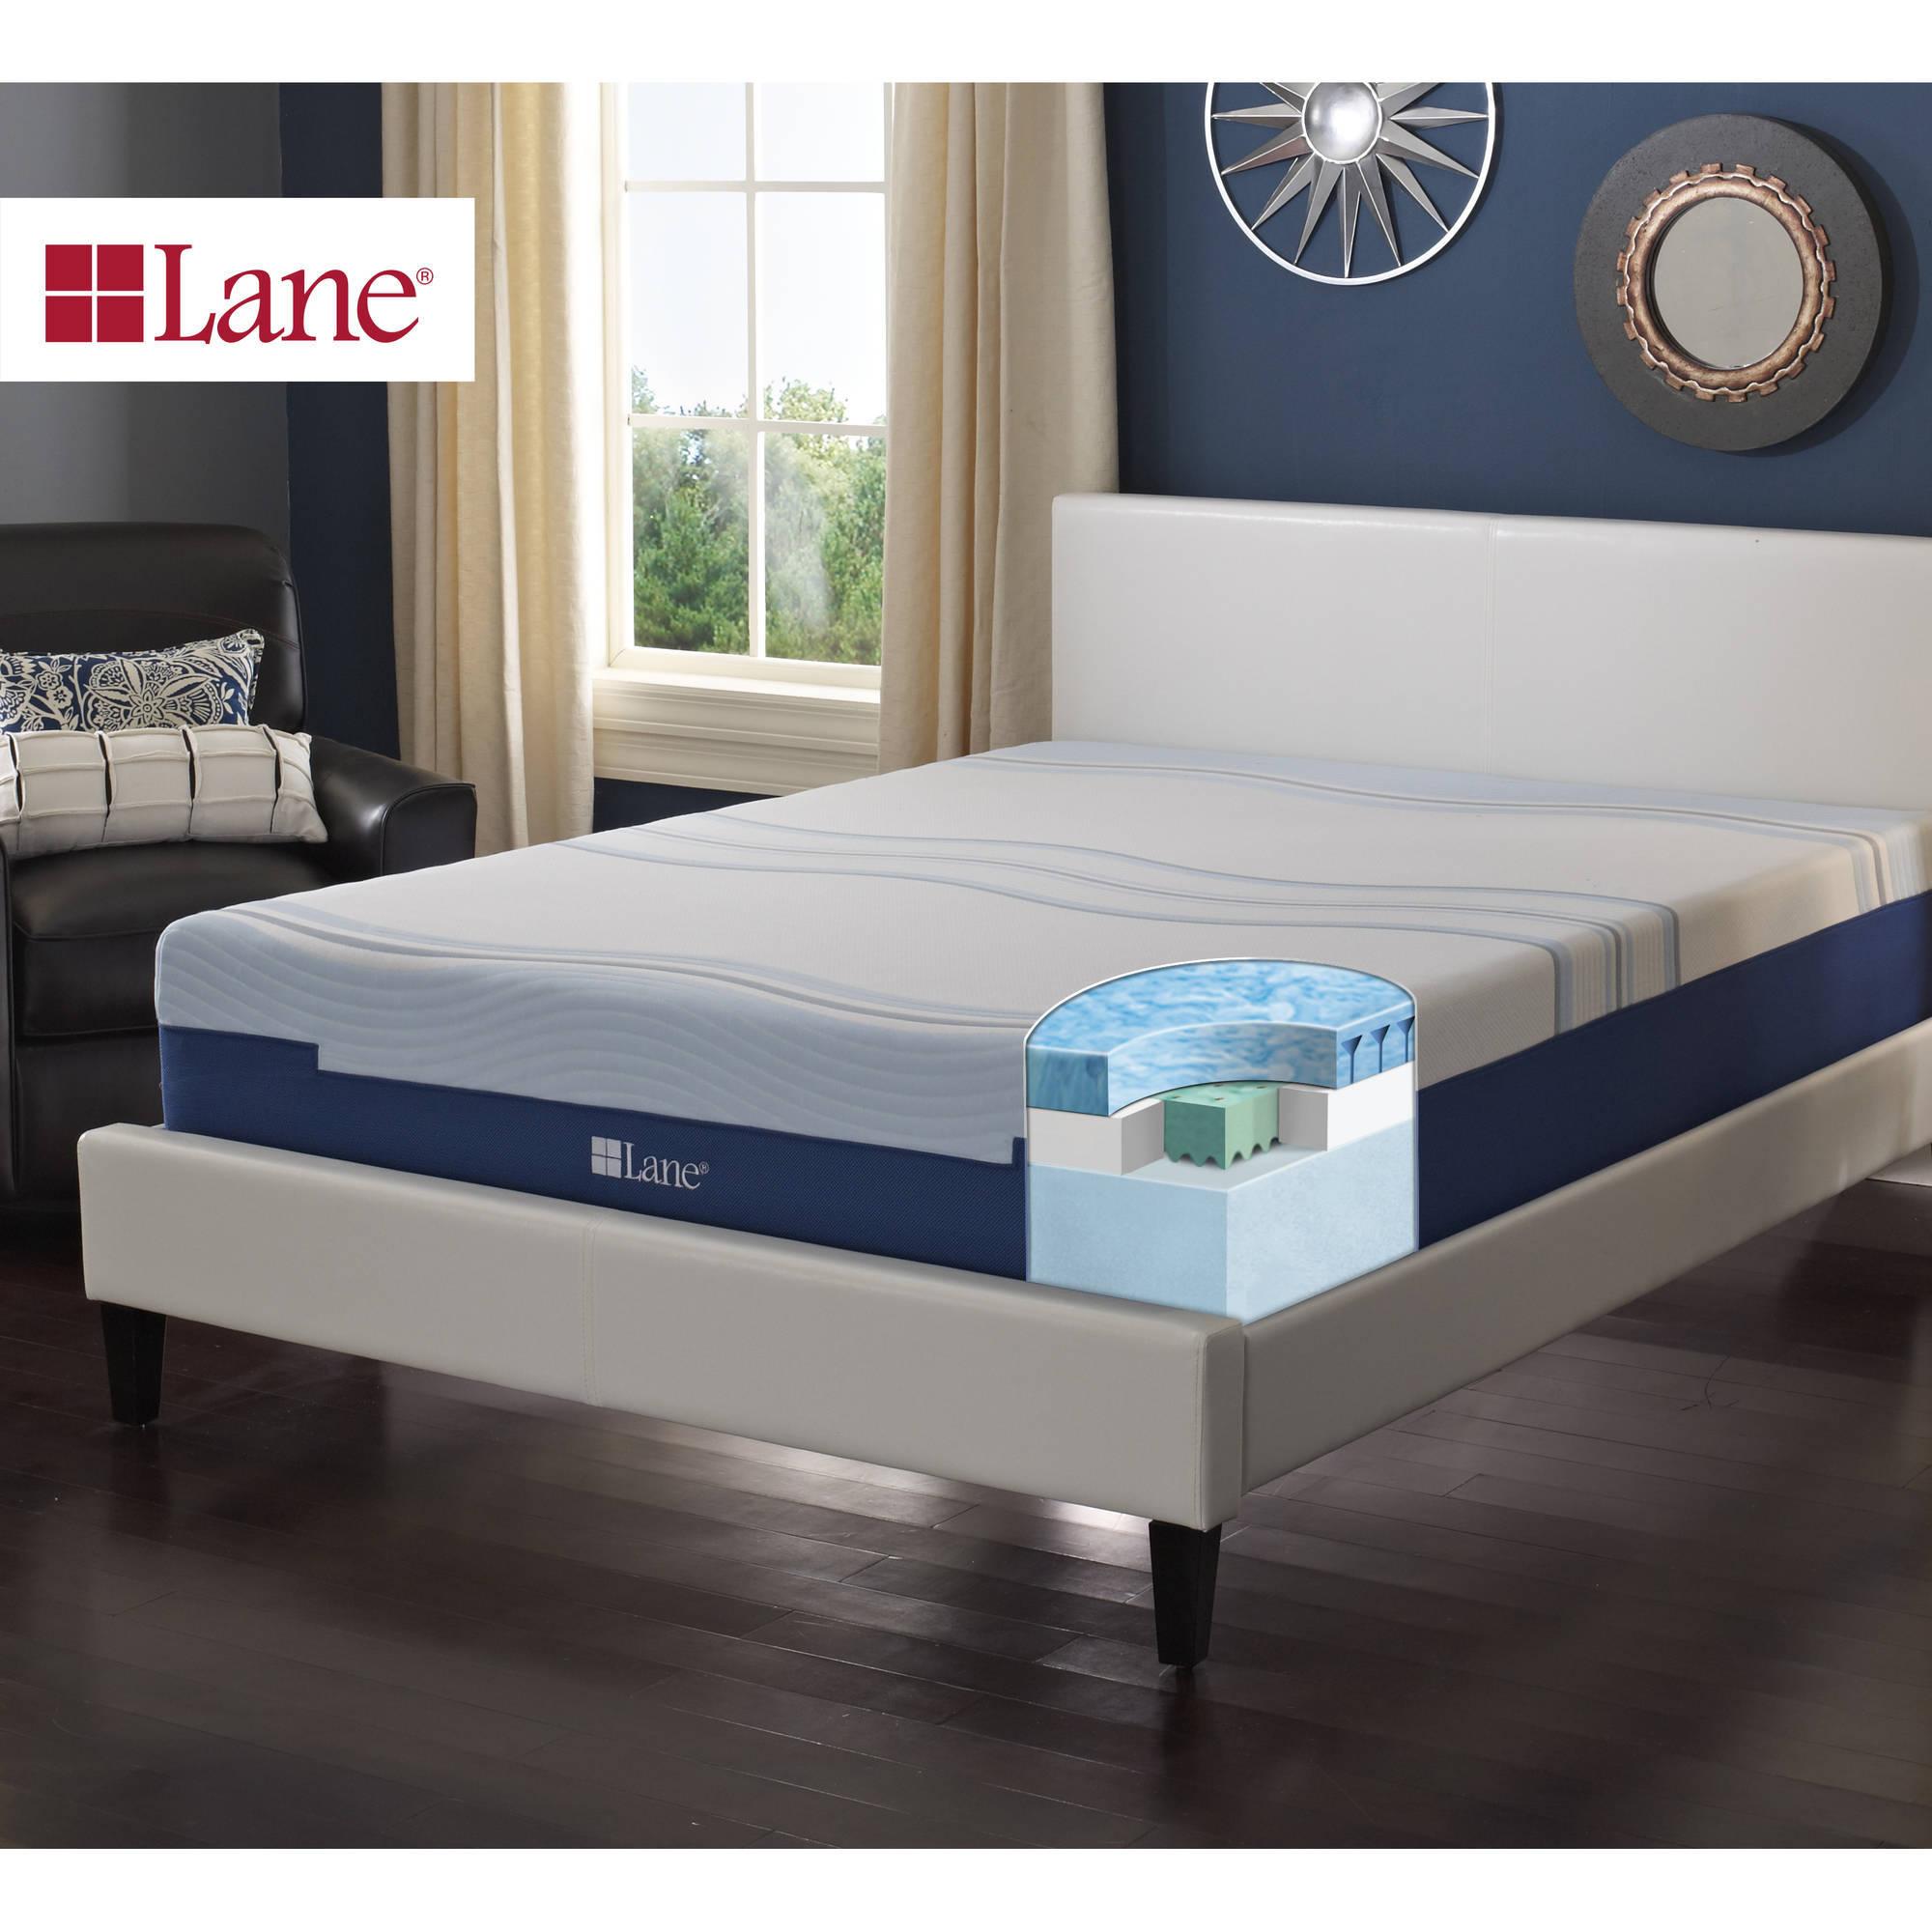 "Contura by Lane 12"" Medium Plush Gellux Fusion Engineered Latex Foam Mattress Bed"